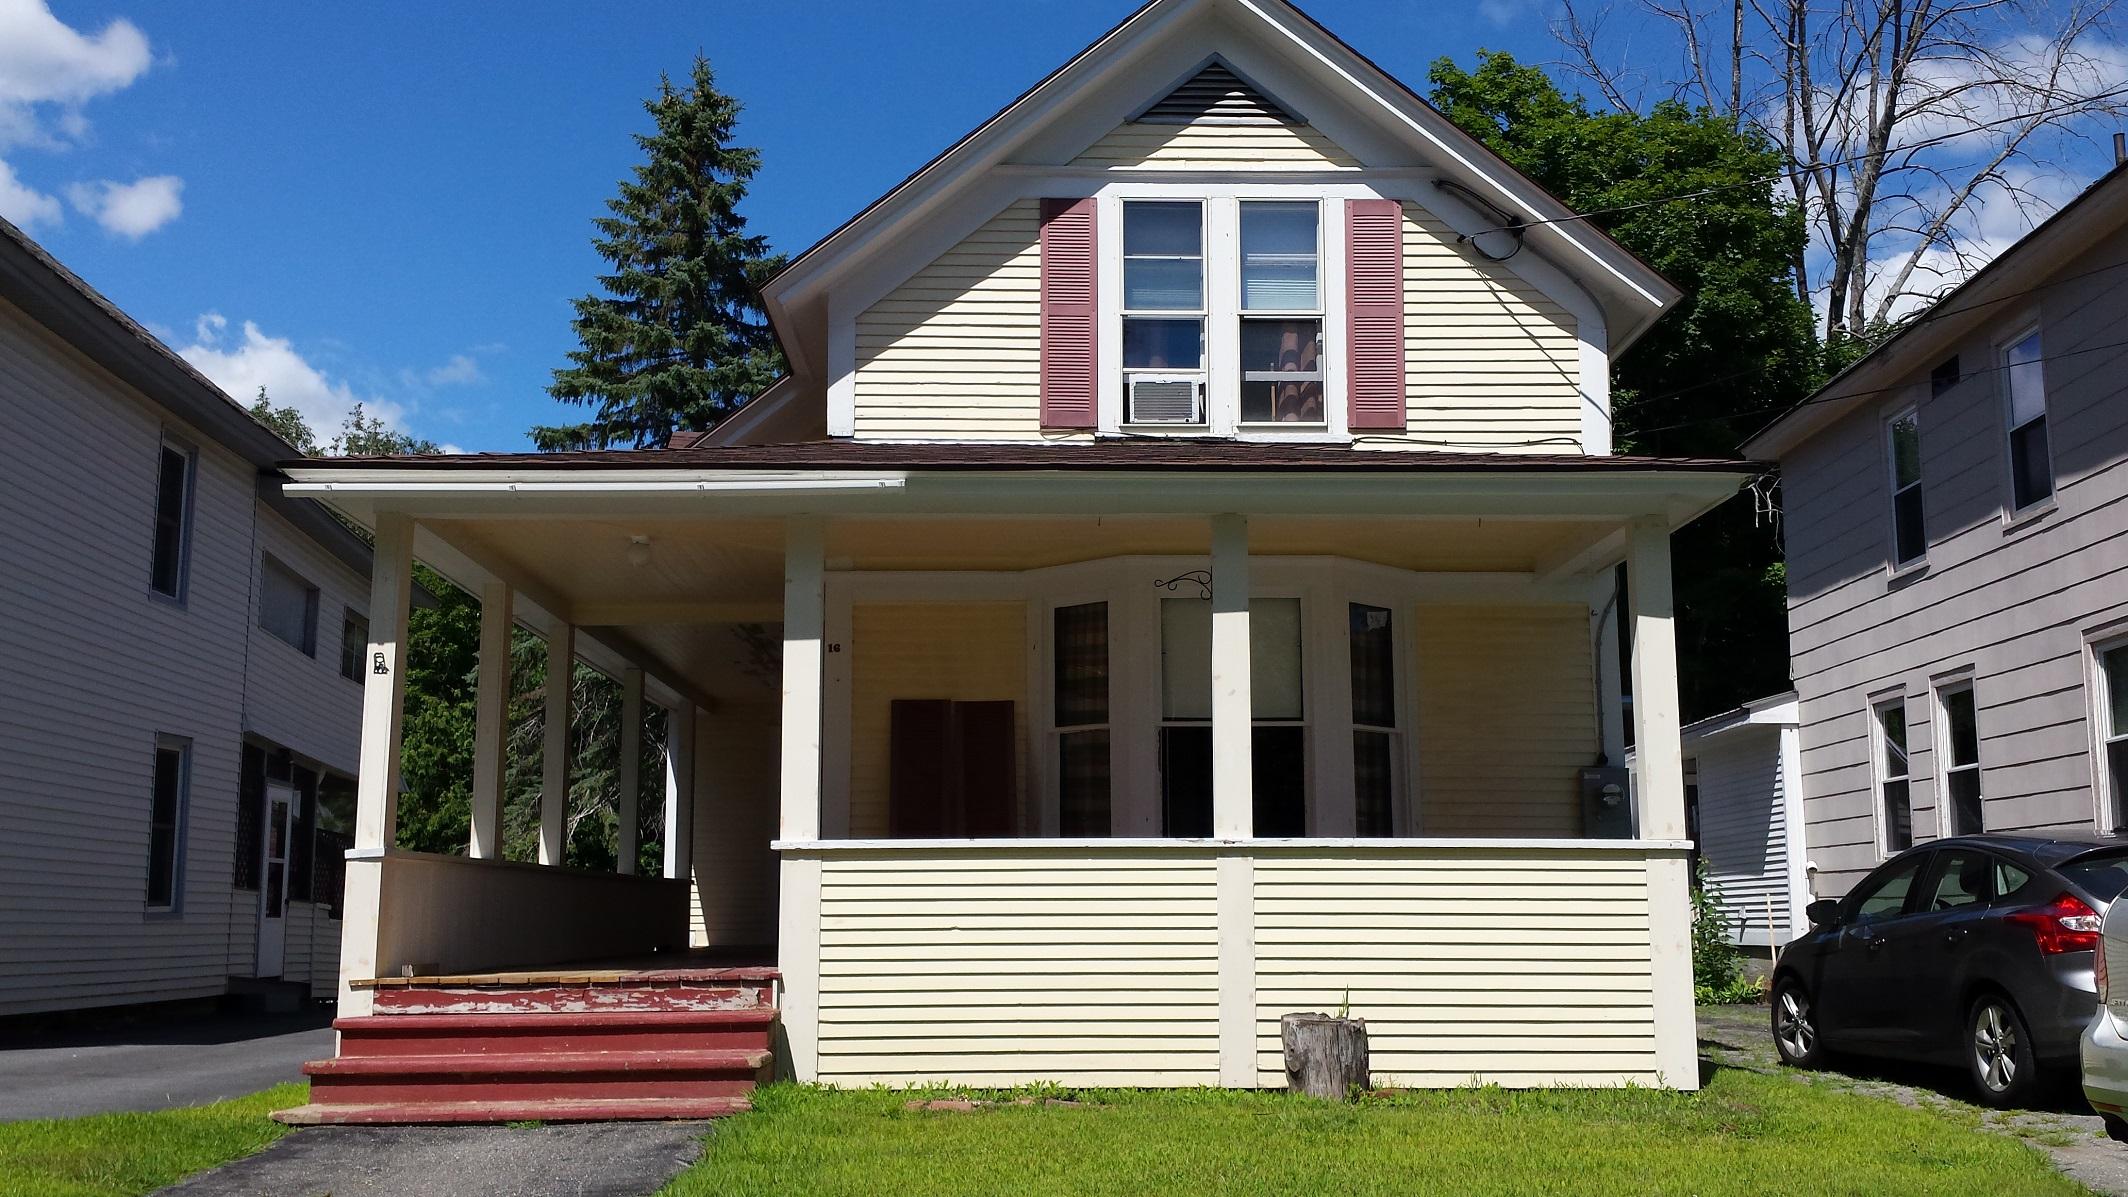 16 Smith Street, Ludlow, Vermont 05149